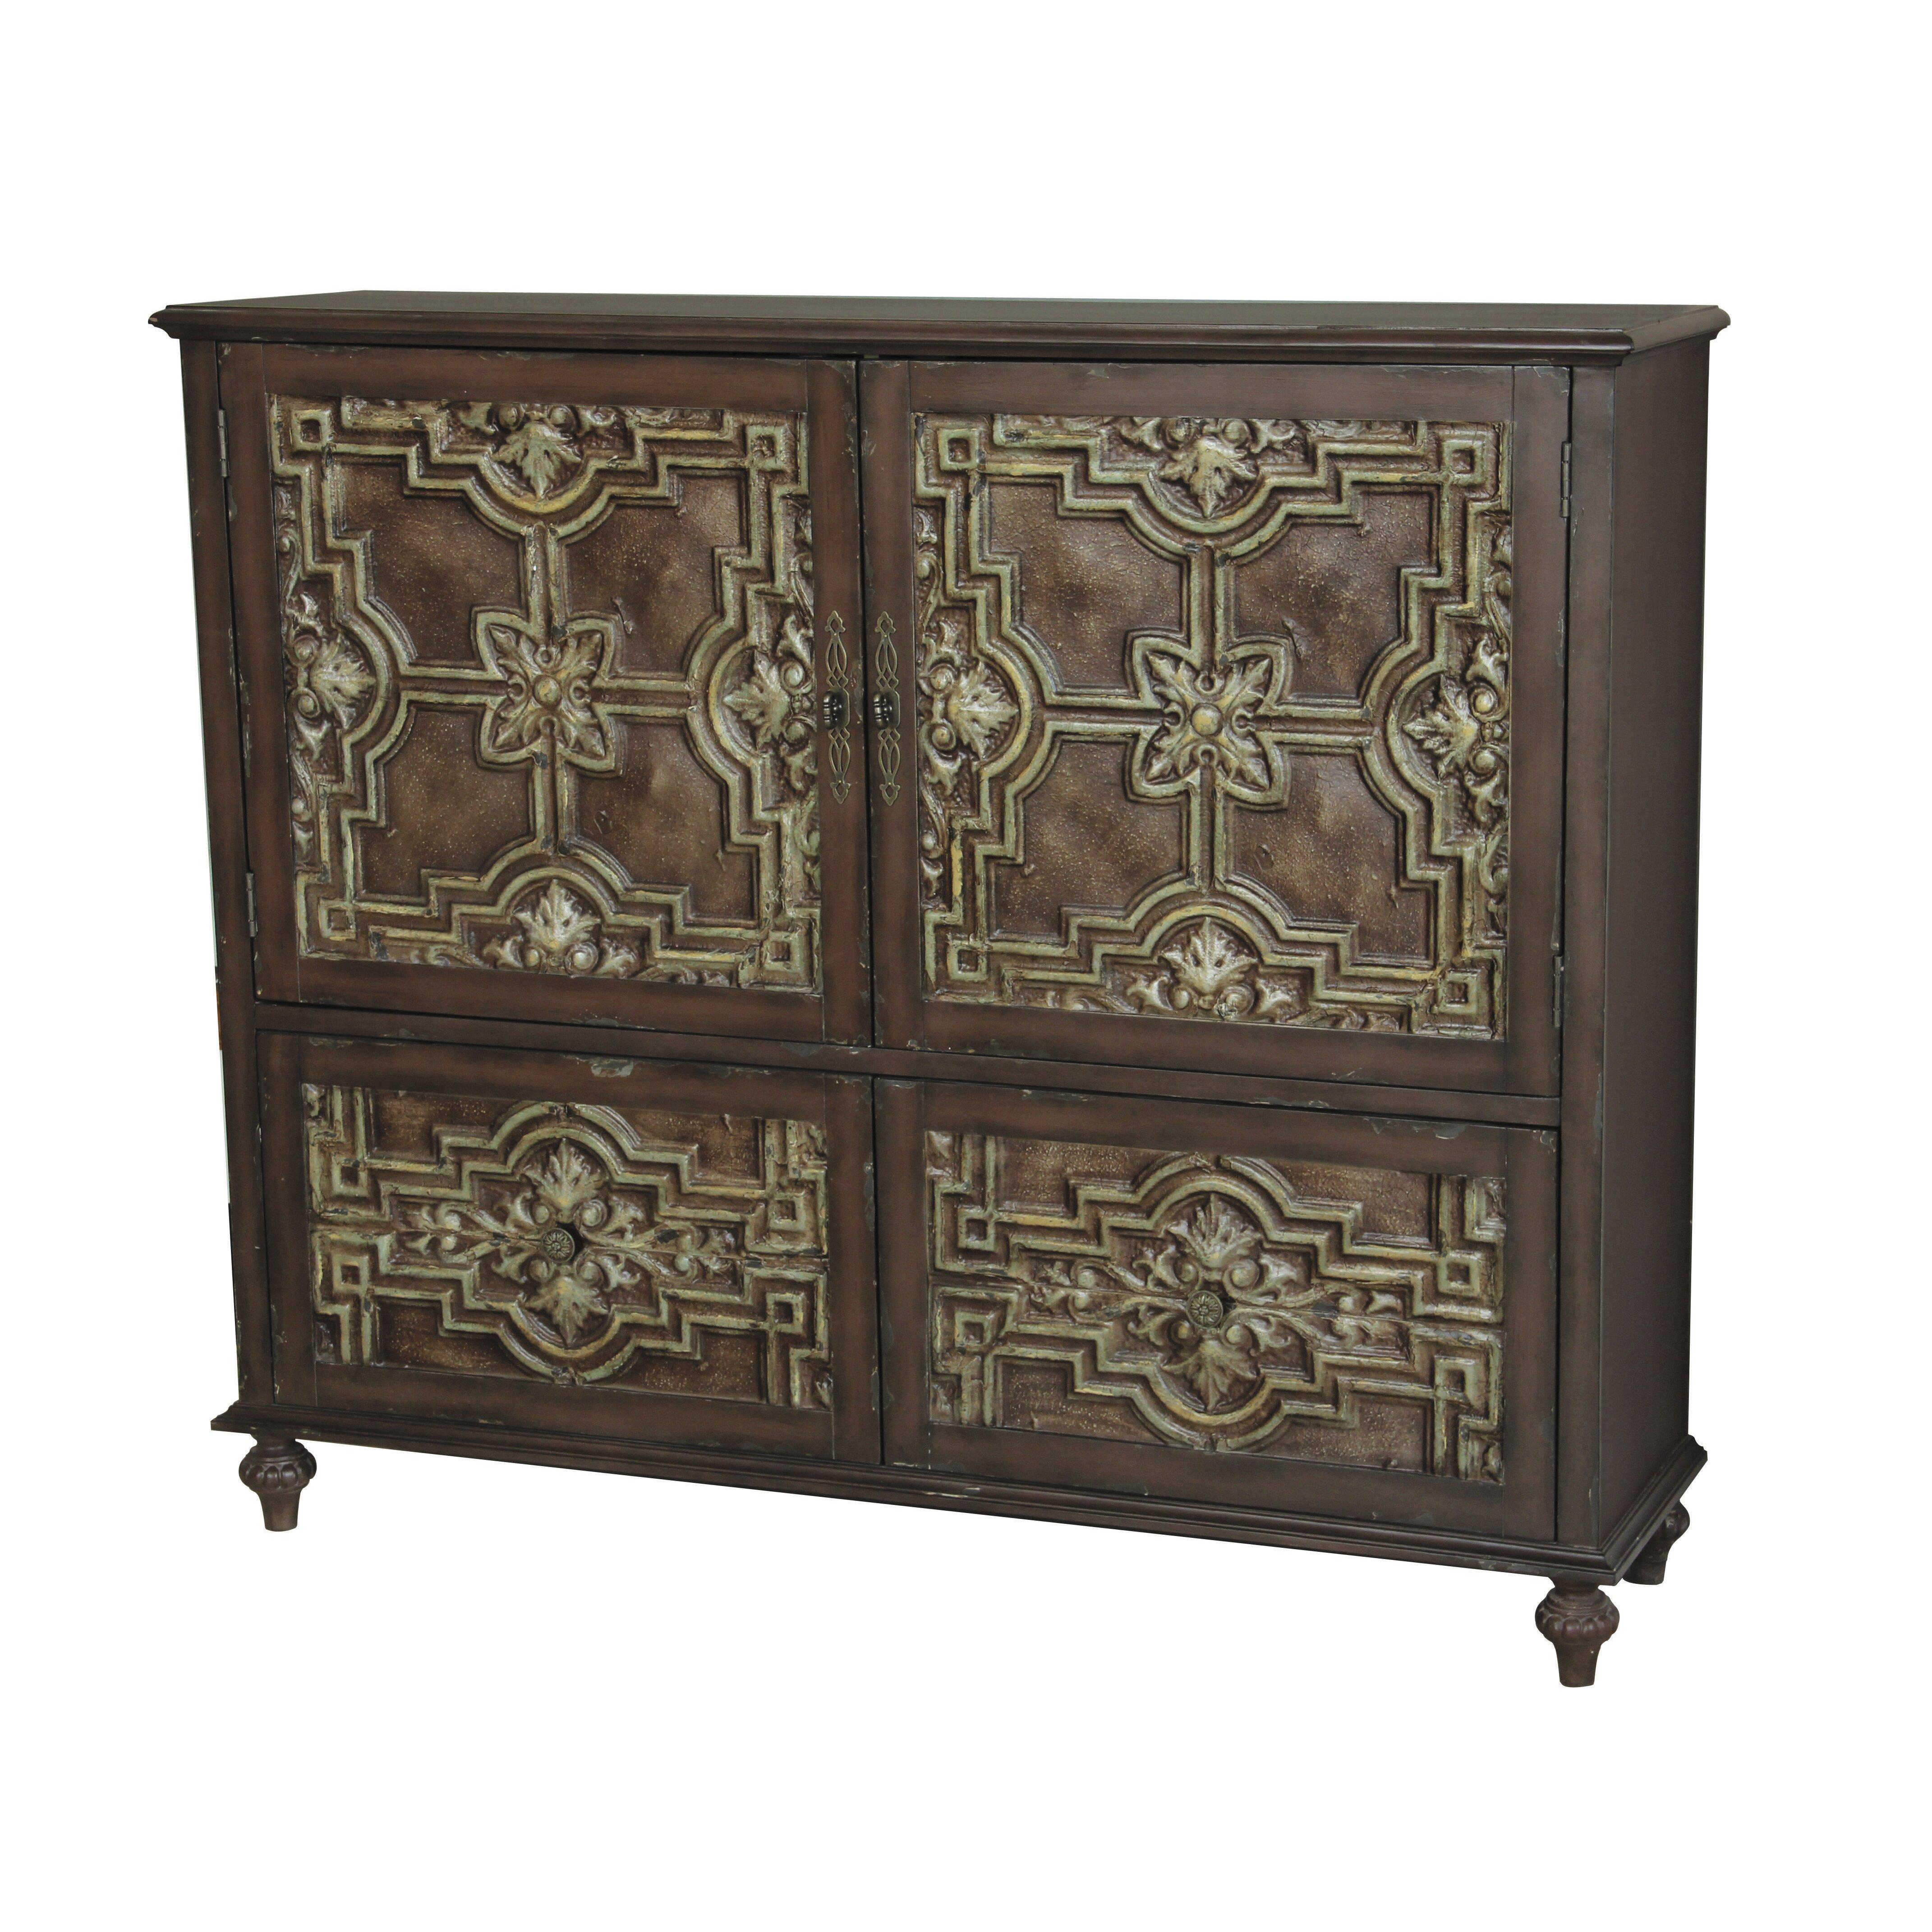 Pulaski accent cabinet reviews wayfair for Pulaski furniture